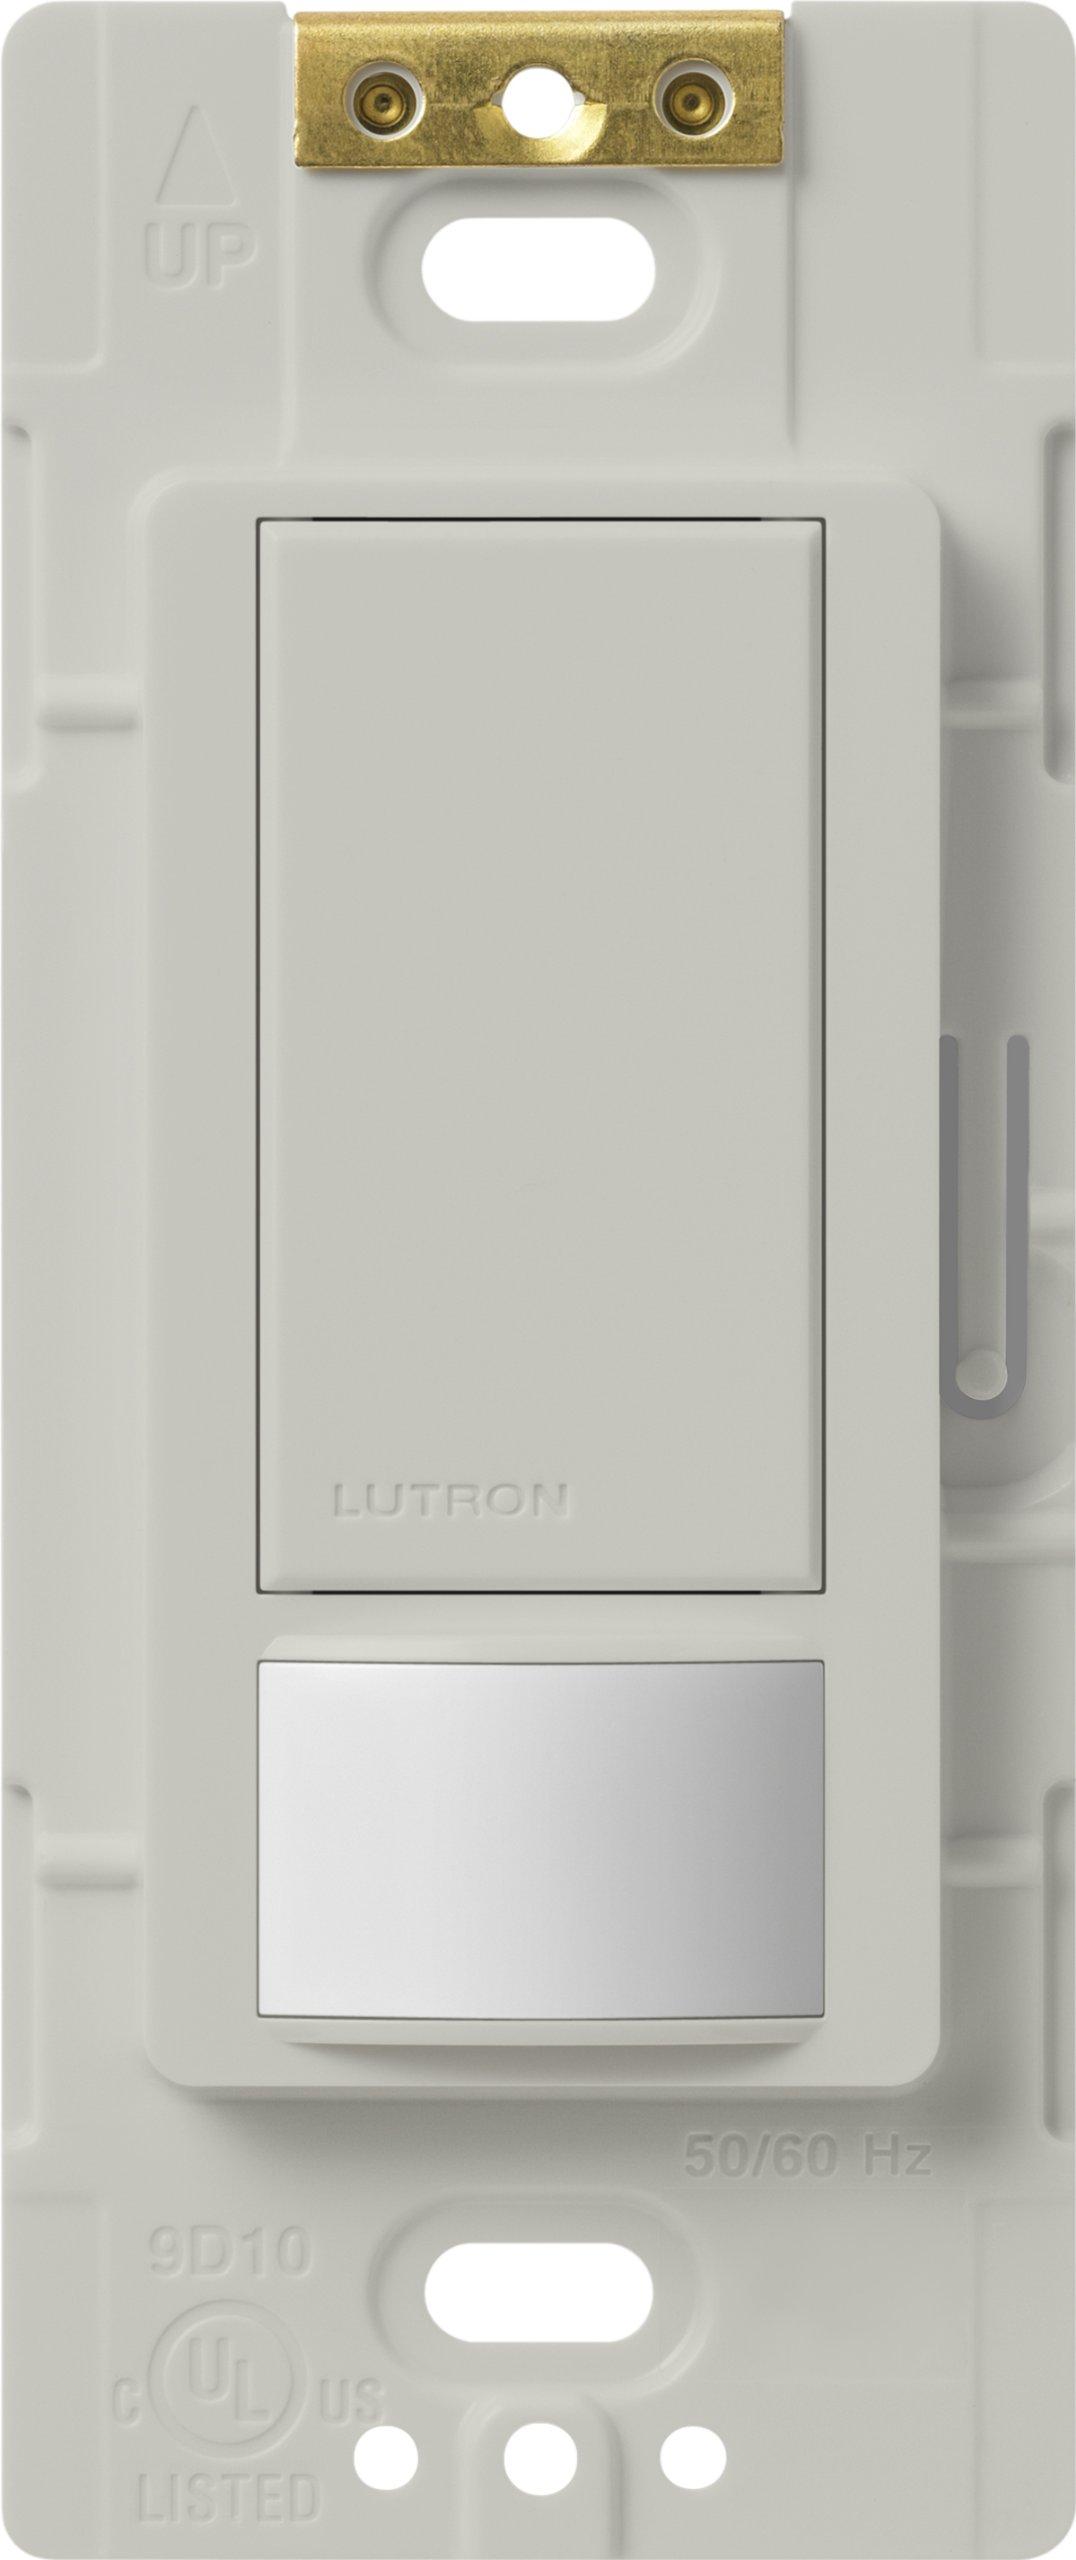 Lutron MS-VPS2-PD VACANCY SENSOR SWITCH, Palladium